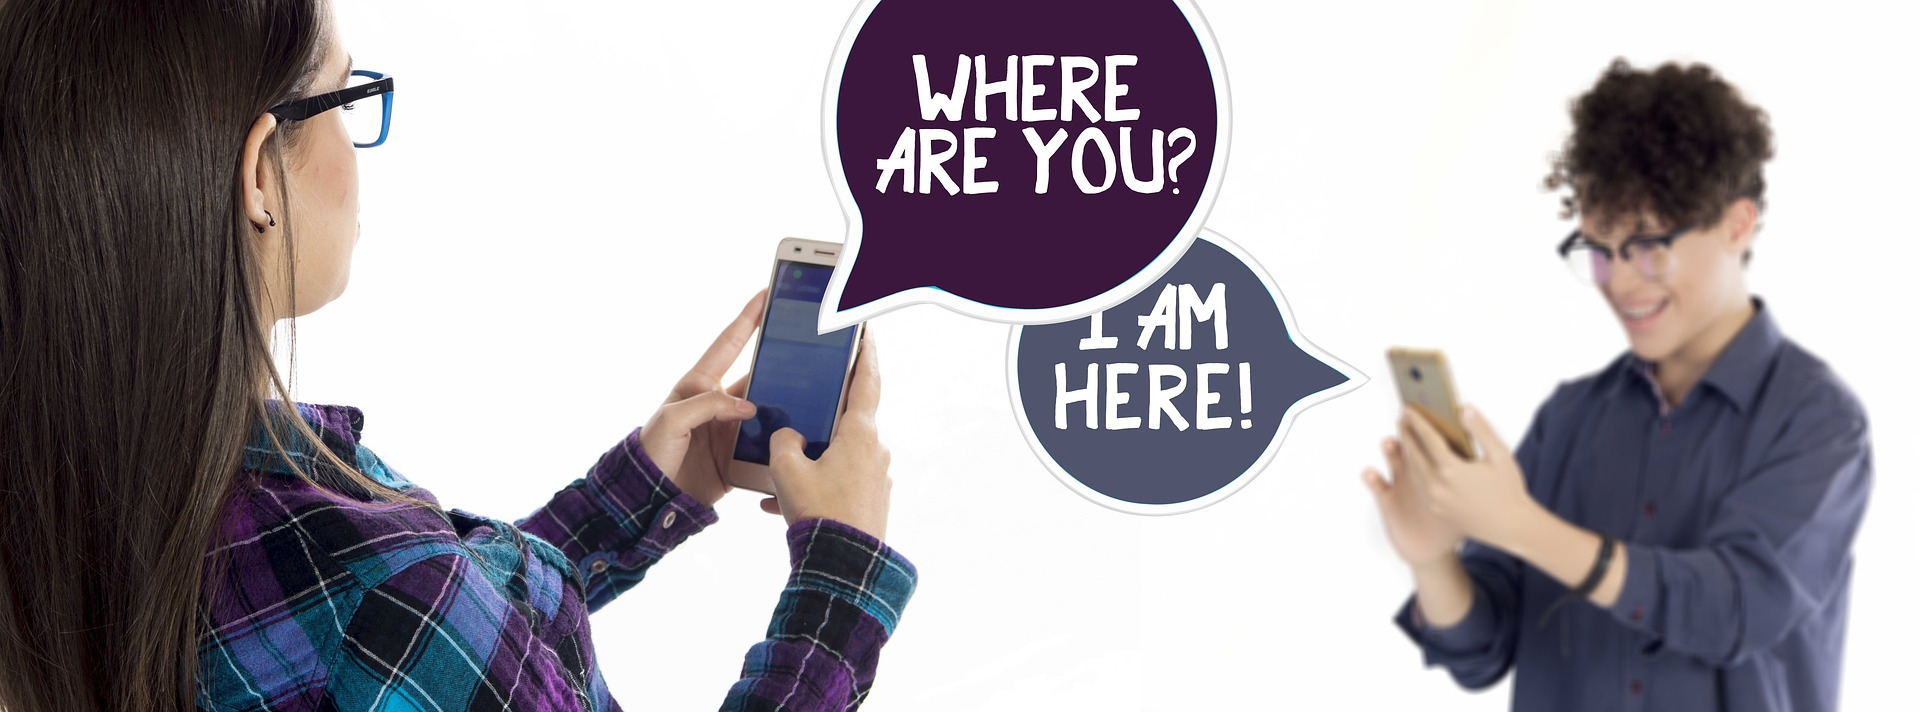 pixabay-smartphone-communication-3232227_1920.jpg